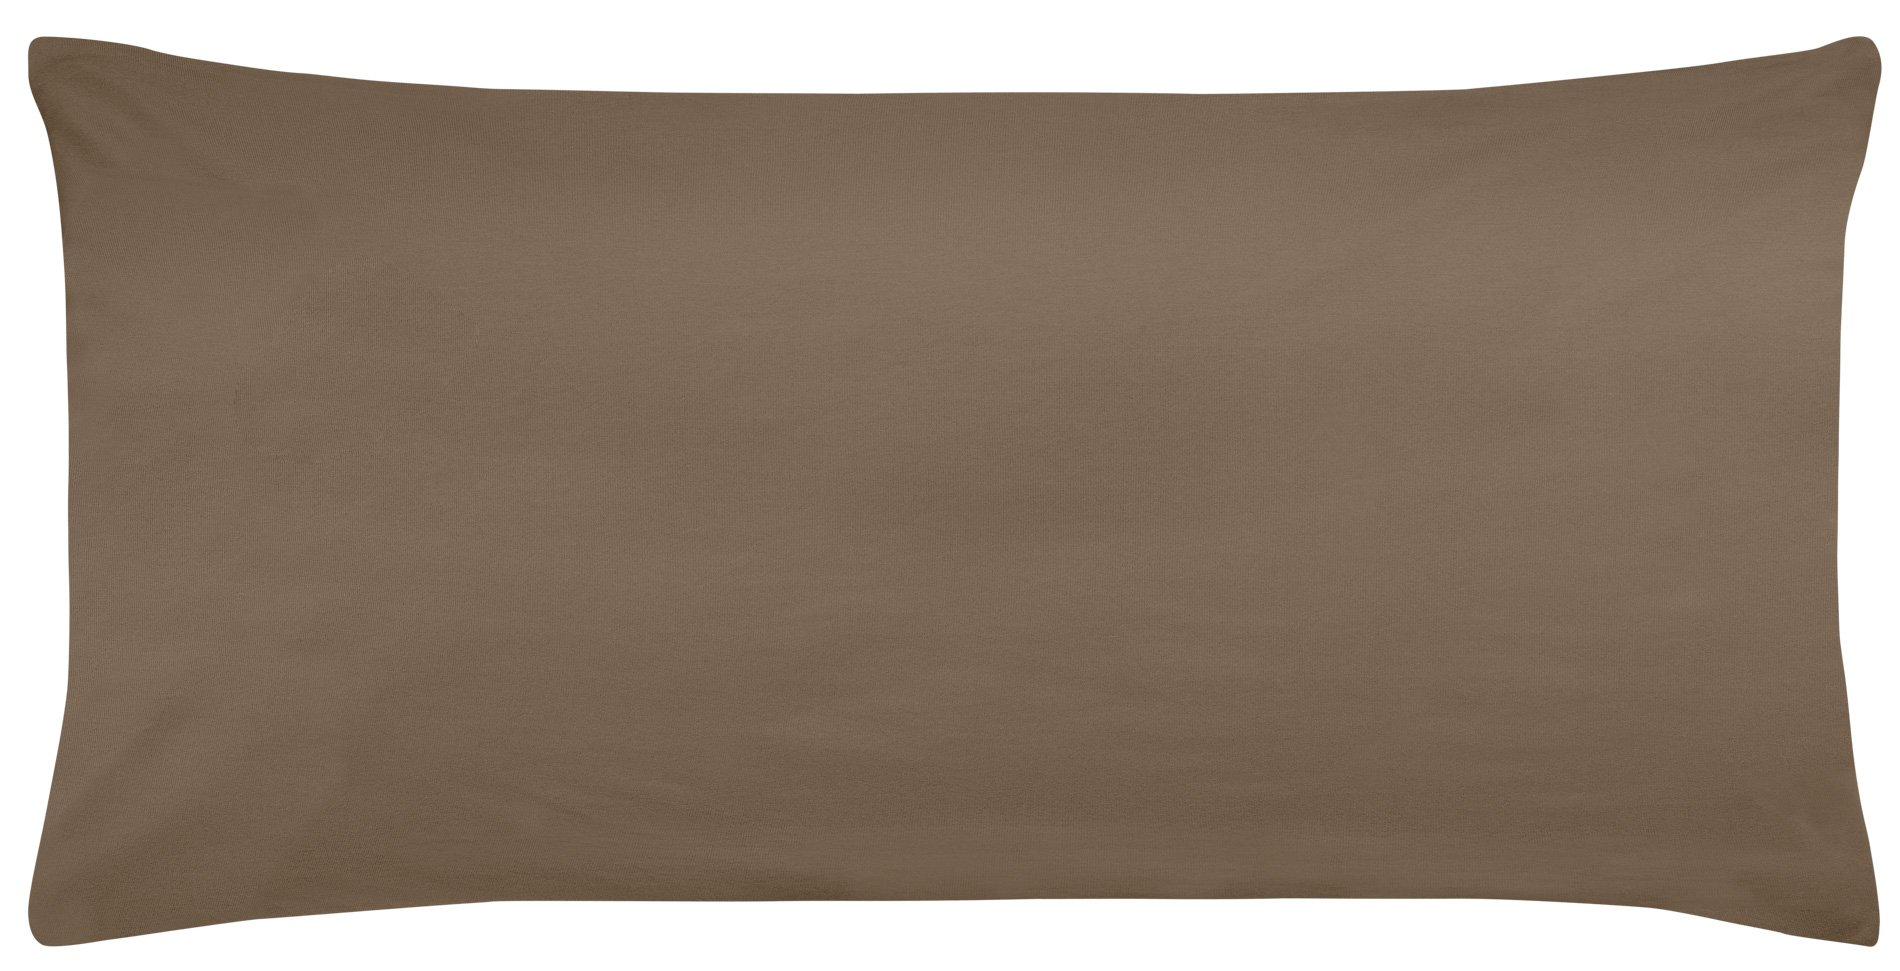 Edel-Zwirn-Jersey toffee B40cm